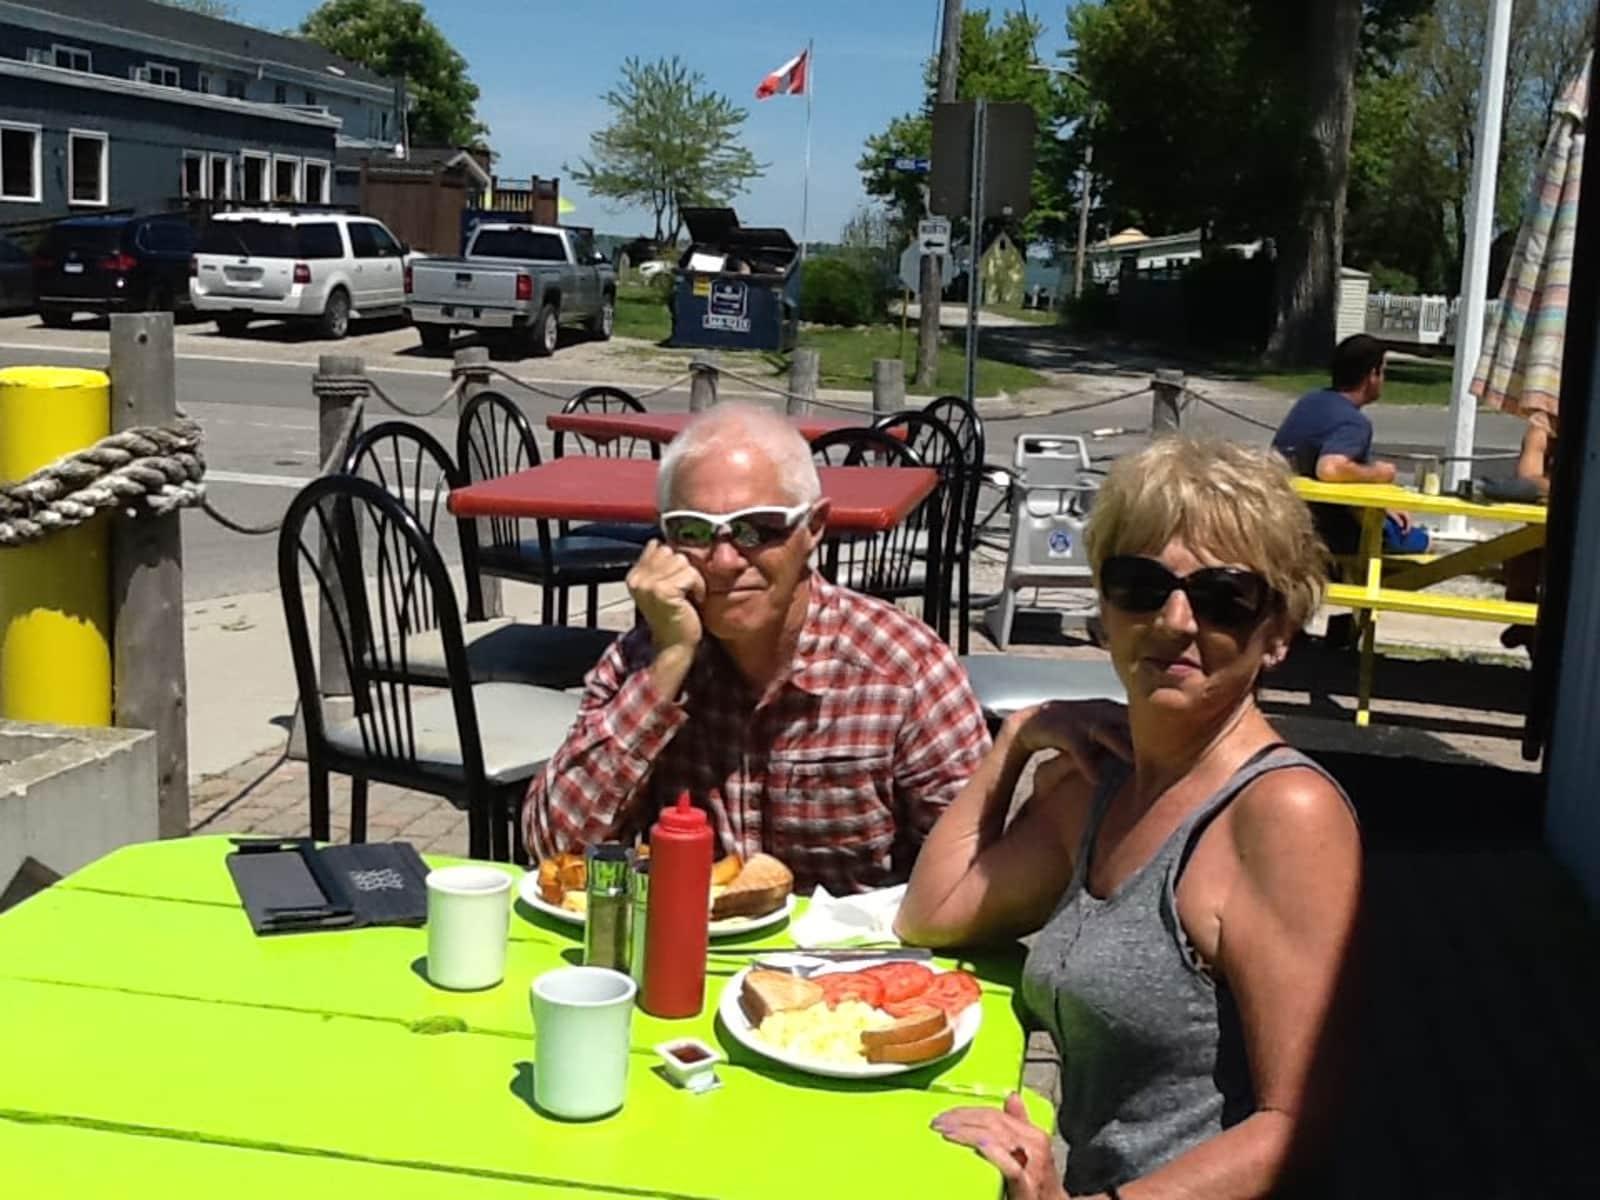 Deborah & Robbie from Windsor, Ontario, Canada